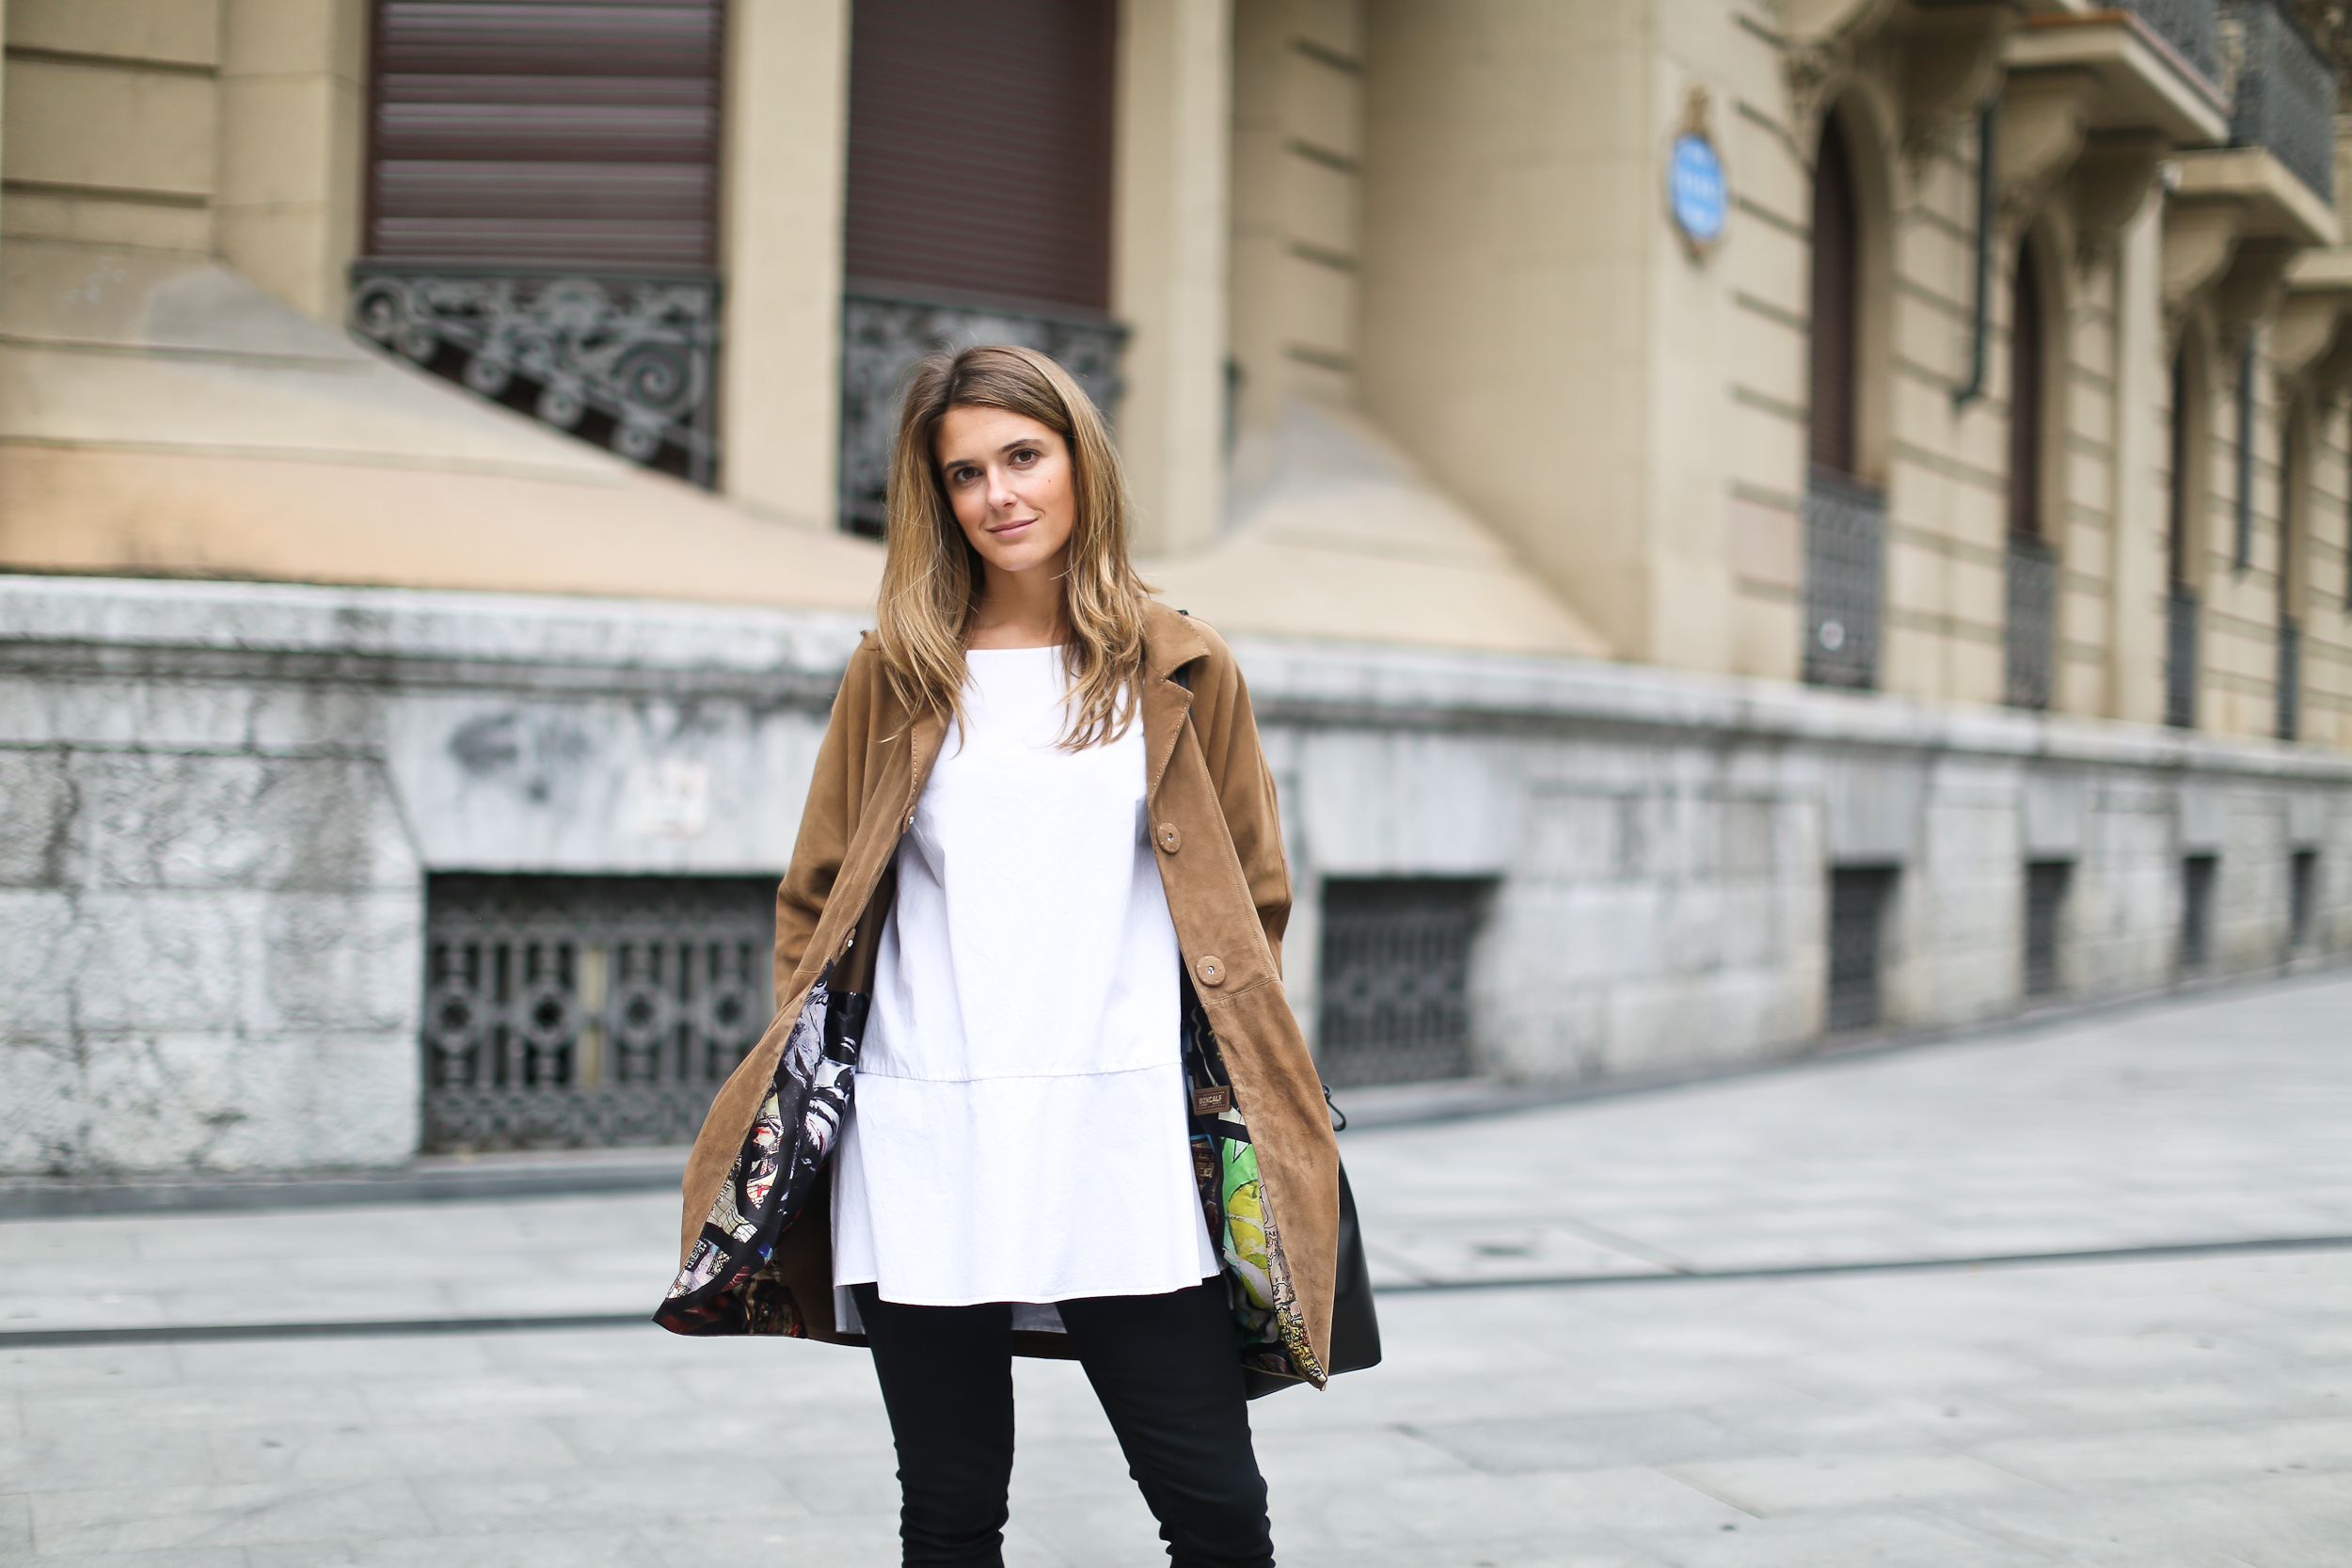 Clochet_streetstyle_boxcalf_chaqueta_ante_platform_brogues_masur_gavriel_bucket_bag-8